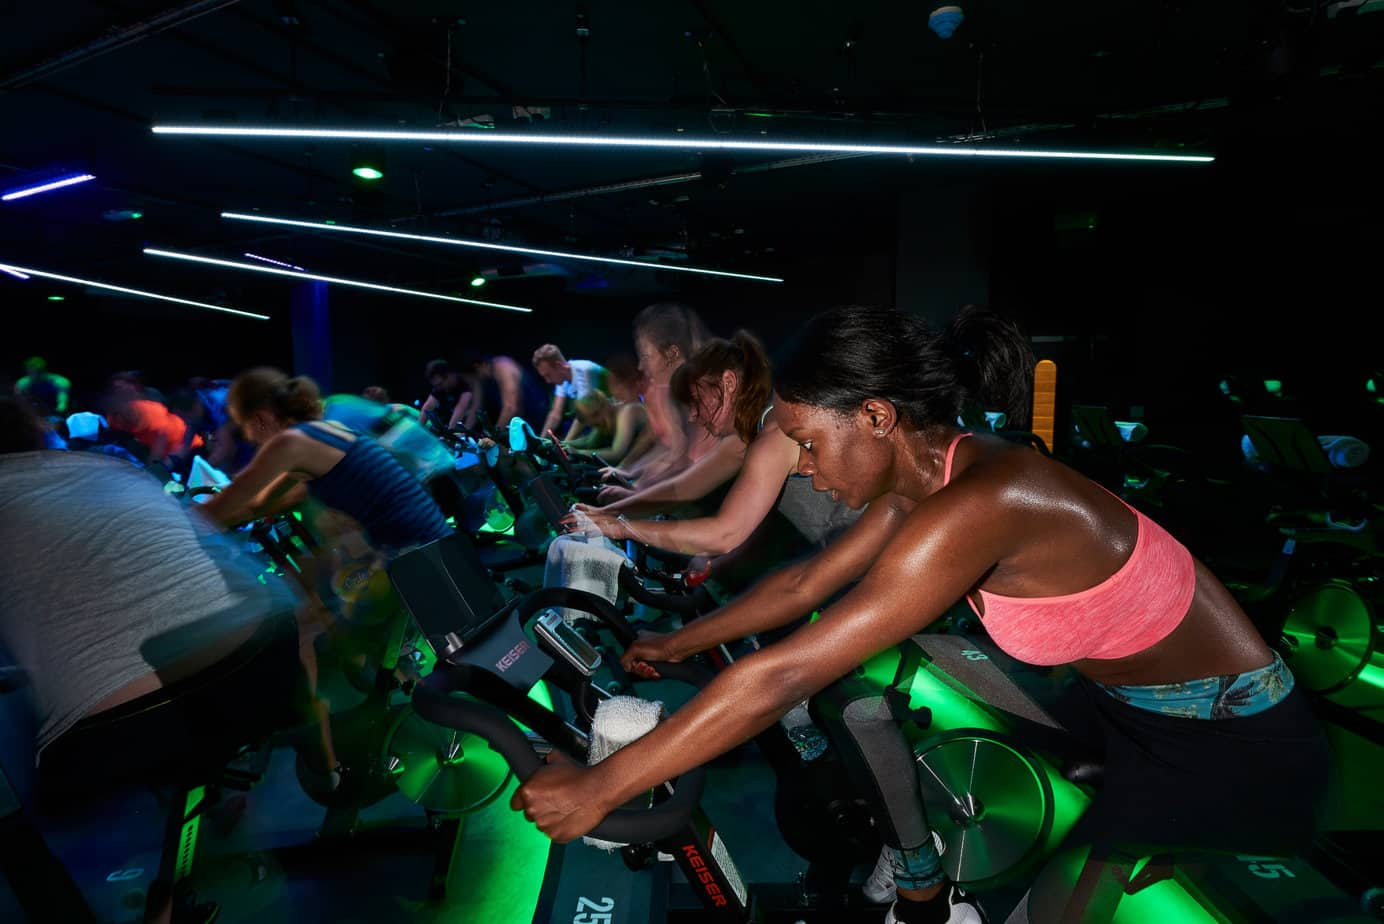 Watch Disco gyms set to hit UK video